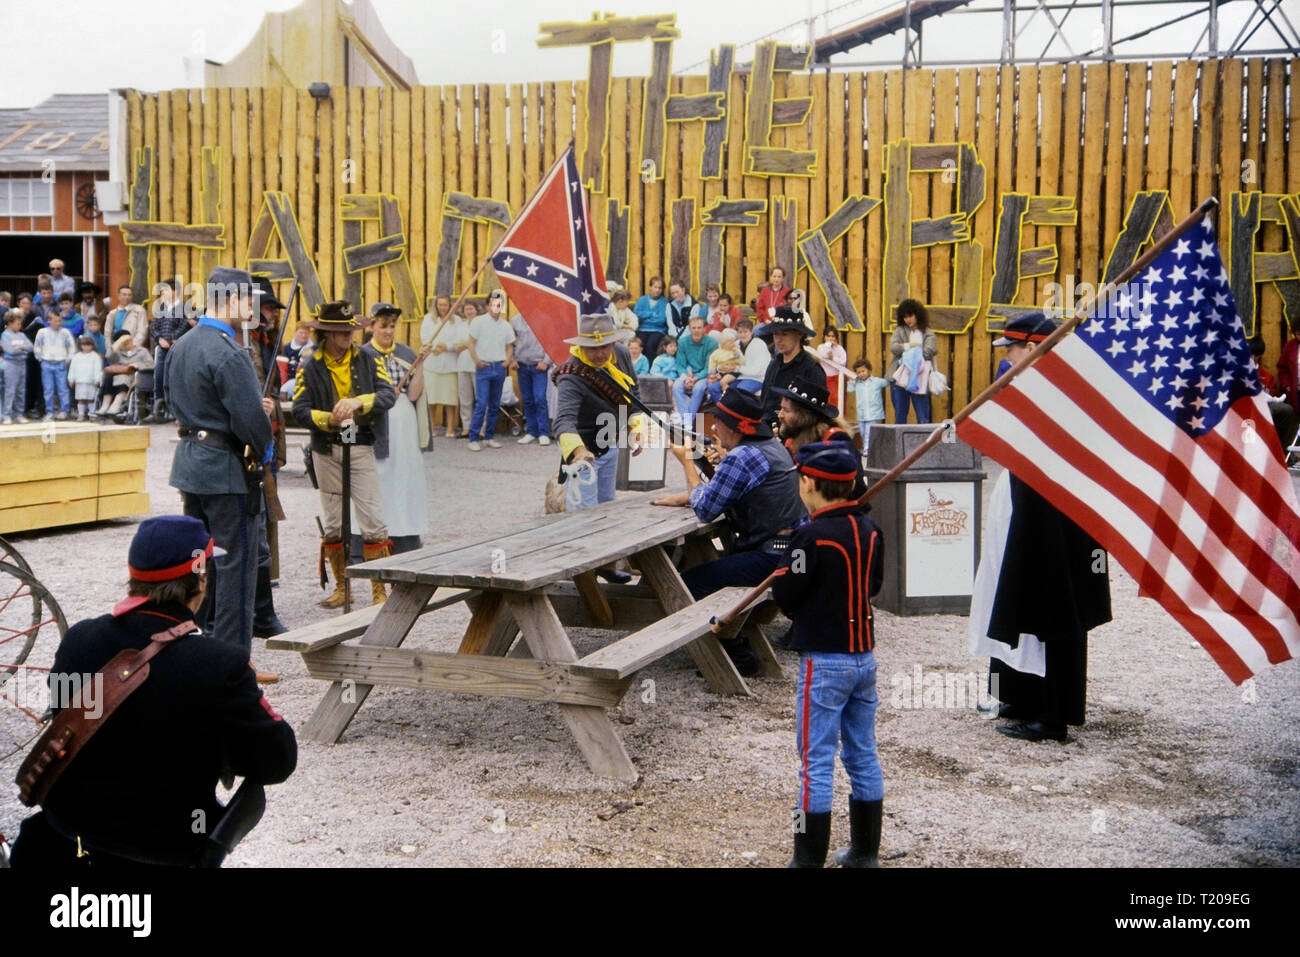 Frontierland Western Theme Park, Morecambe, Lancashire, England, UK. Circa 1980's Stock Photo